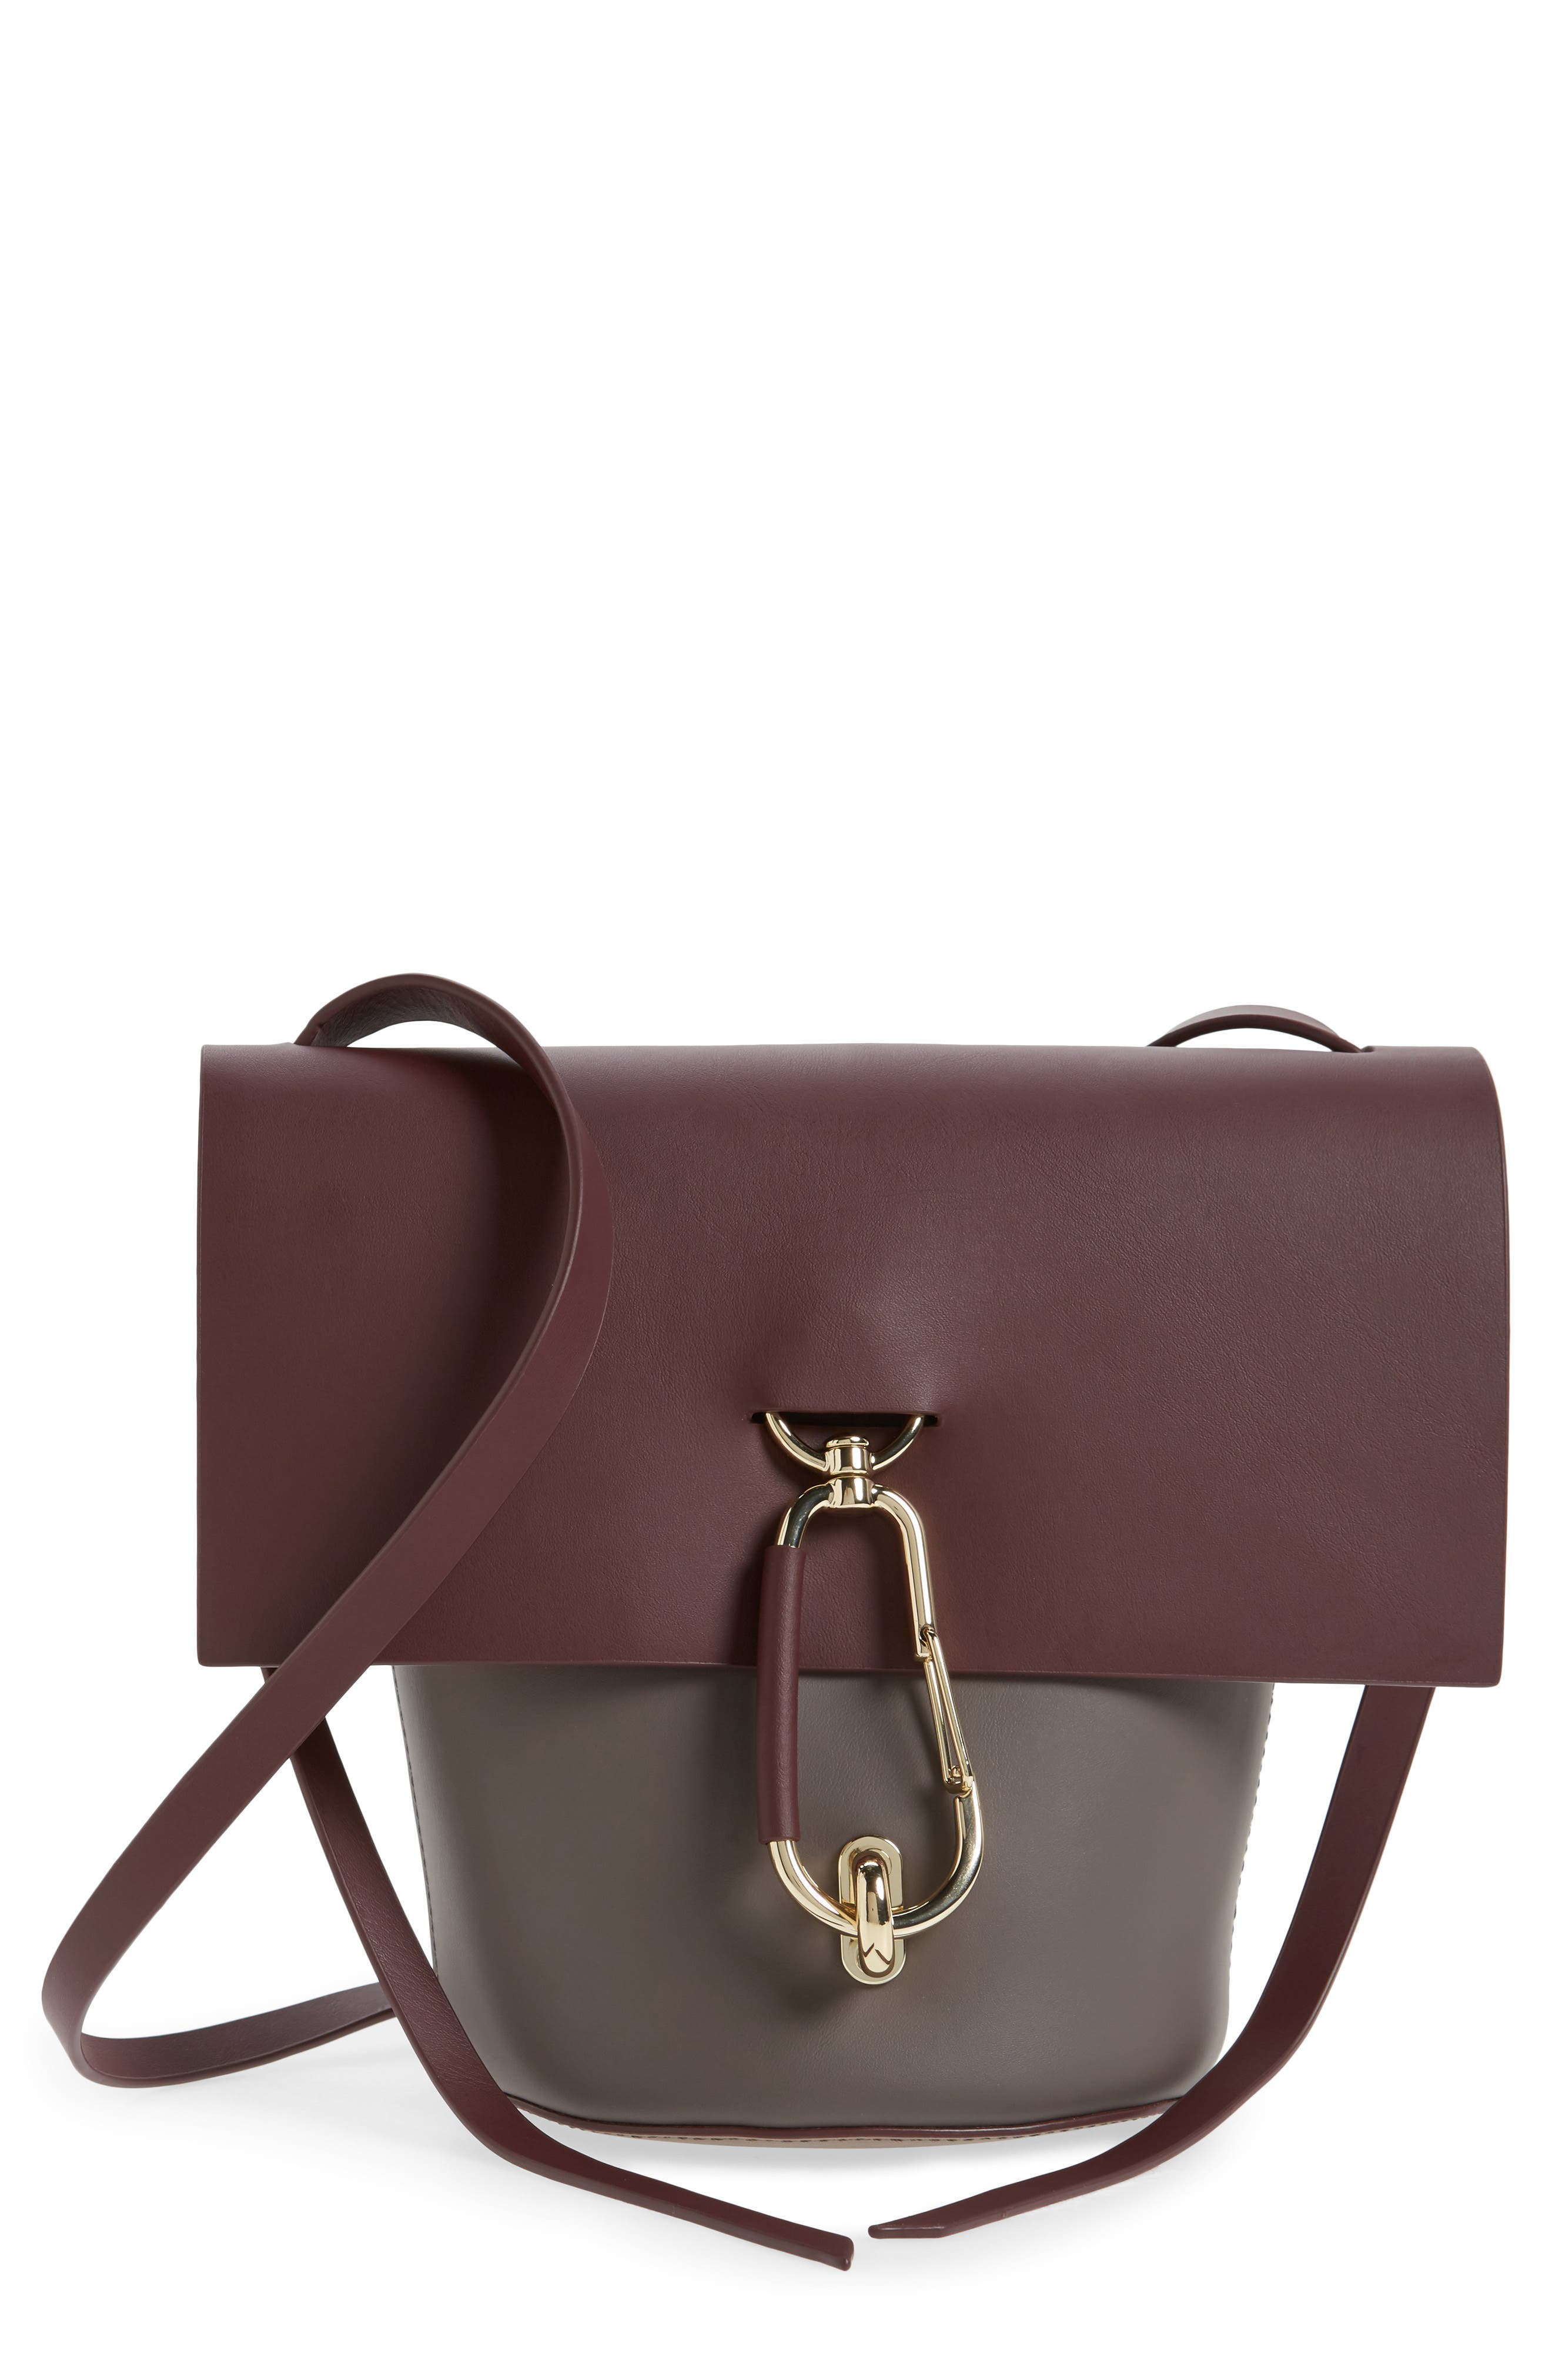 ZAC Zac Posen Belay Colorblocked Leather Crossbody Bucket Bag